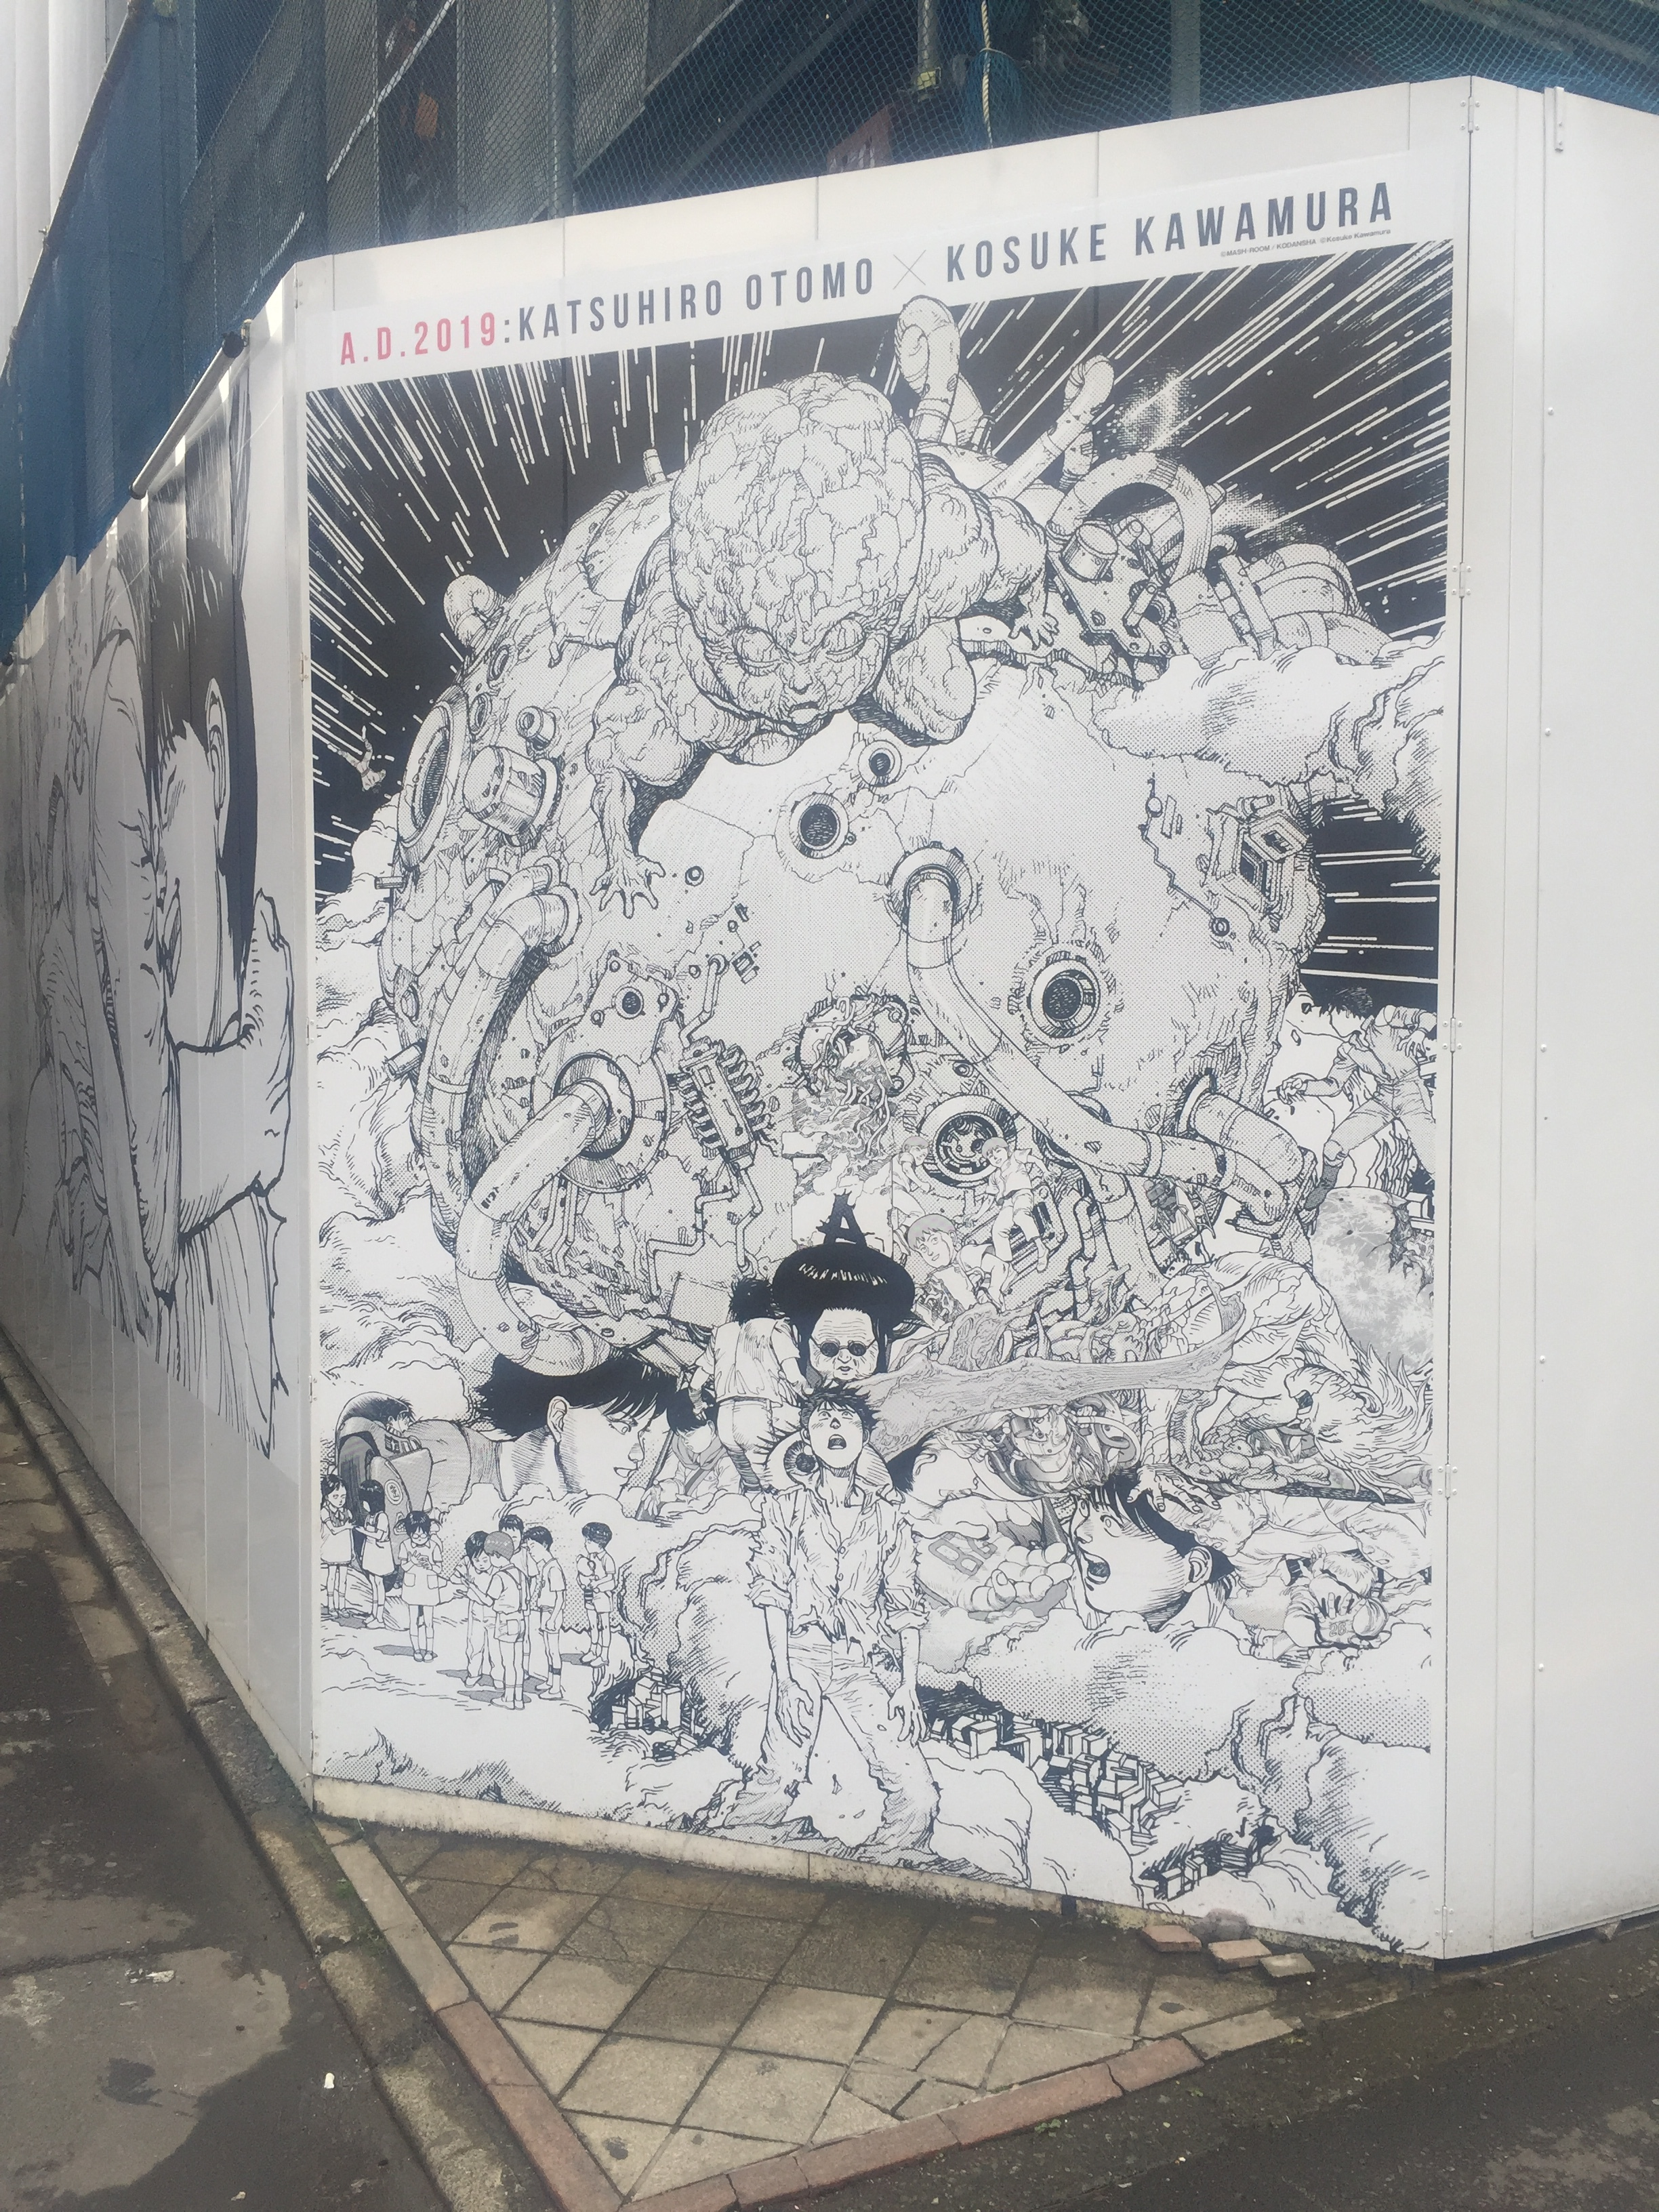 akira 2019 display shibuya tokyo.JPG